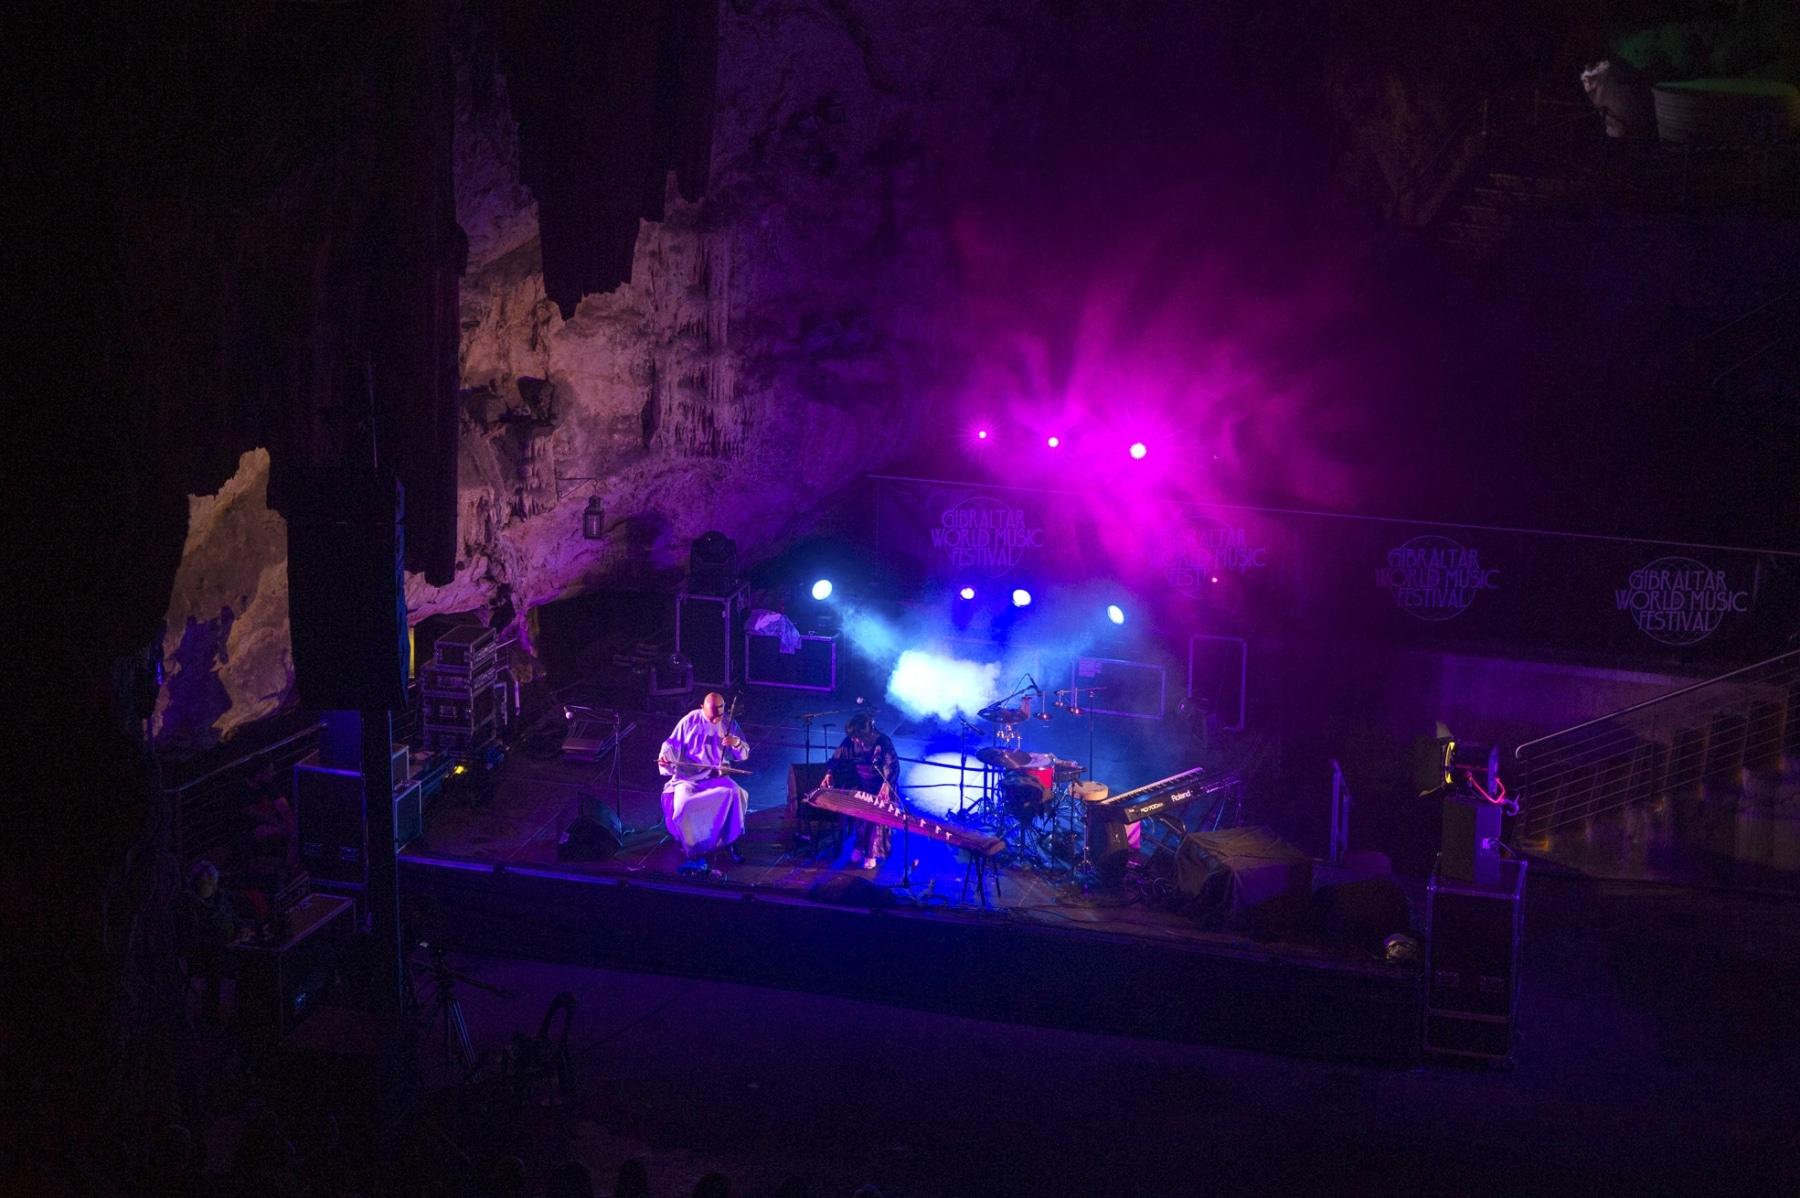 19-junio-gibraltar-world-music-festival01_14464523455_o